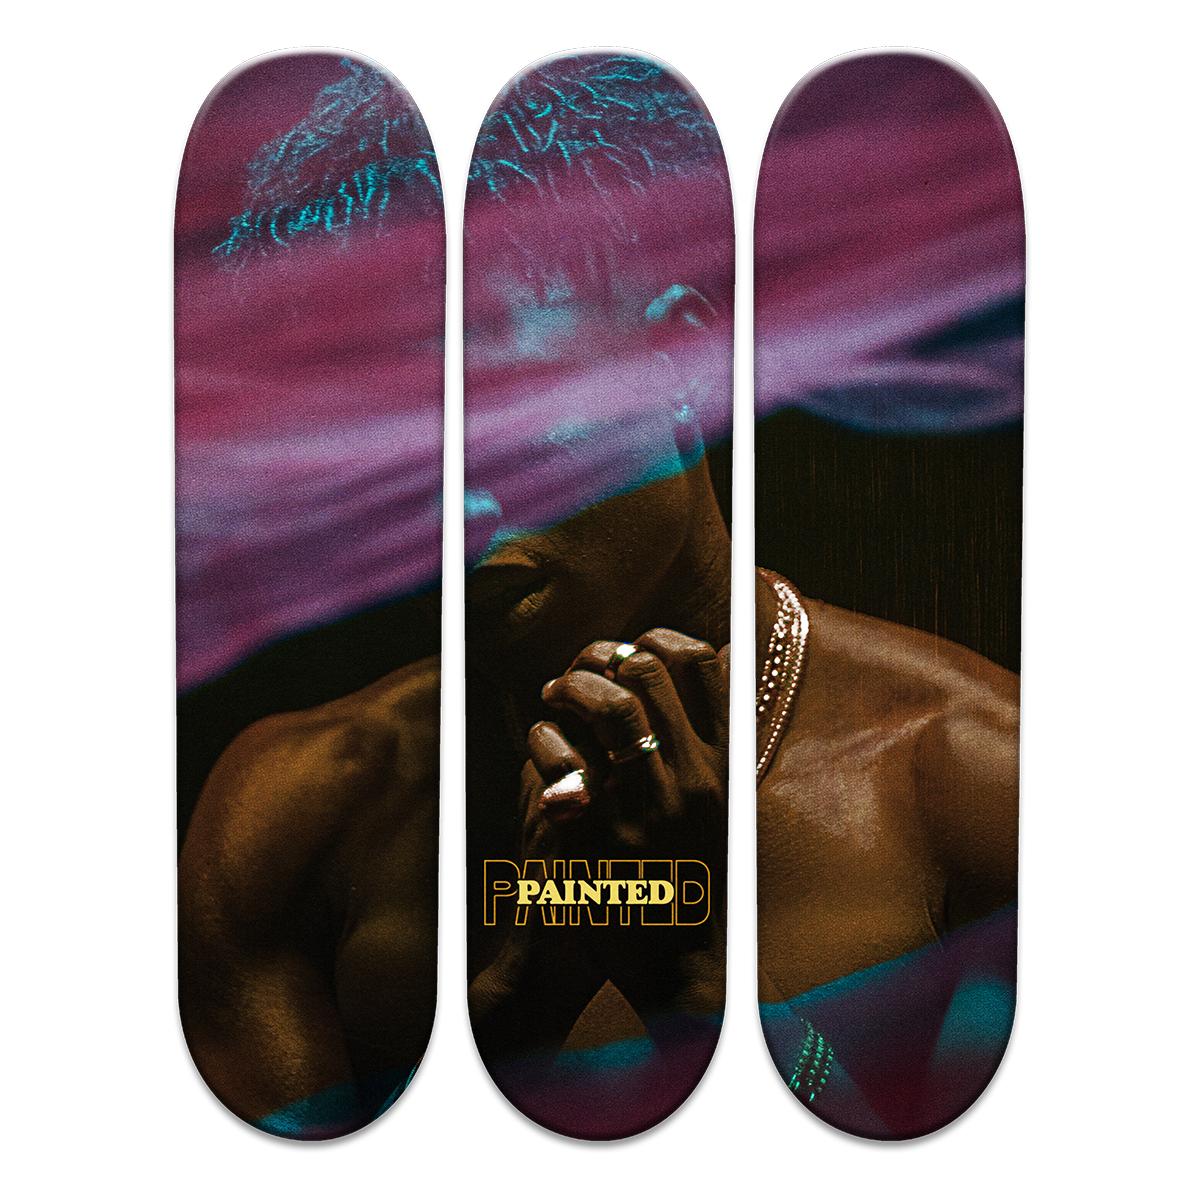 Painted Skateboard Art